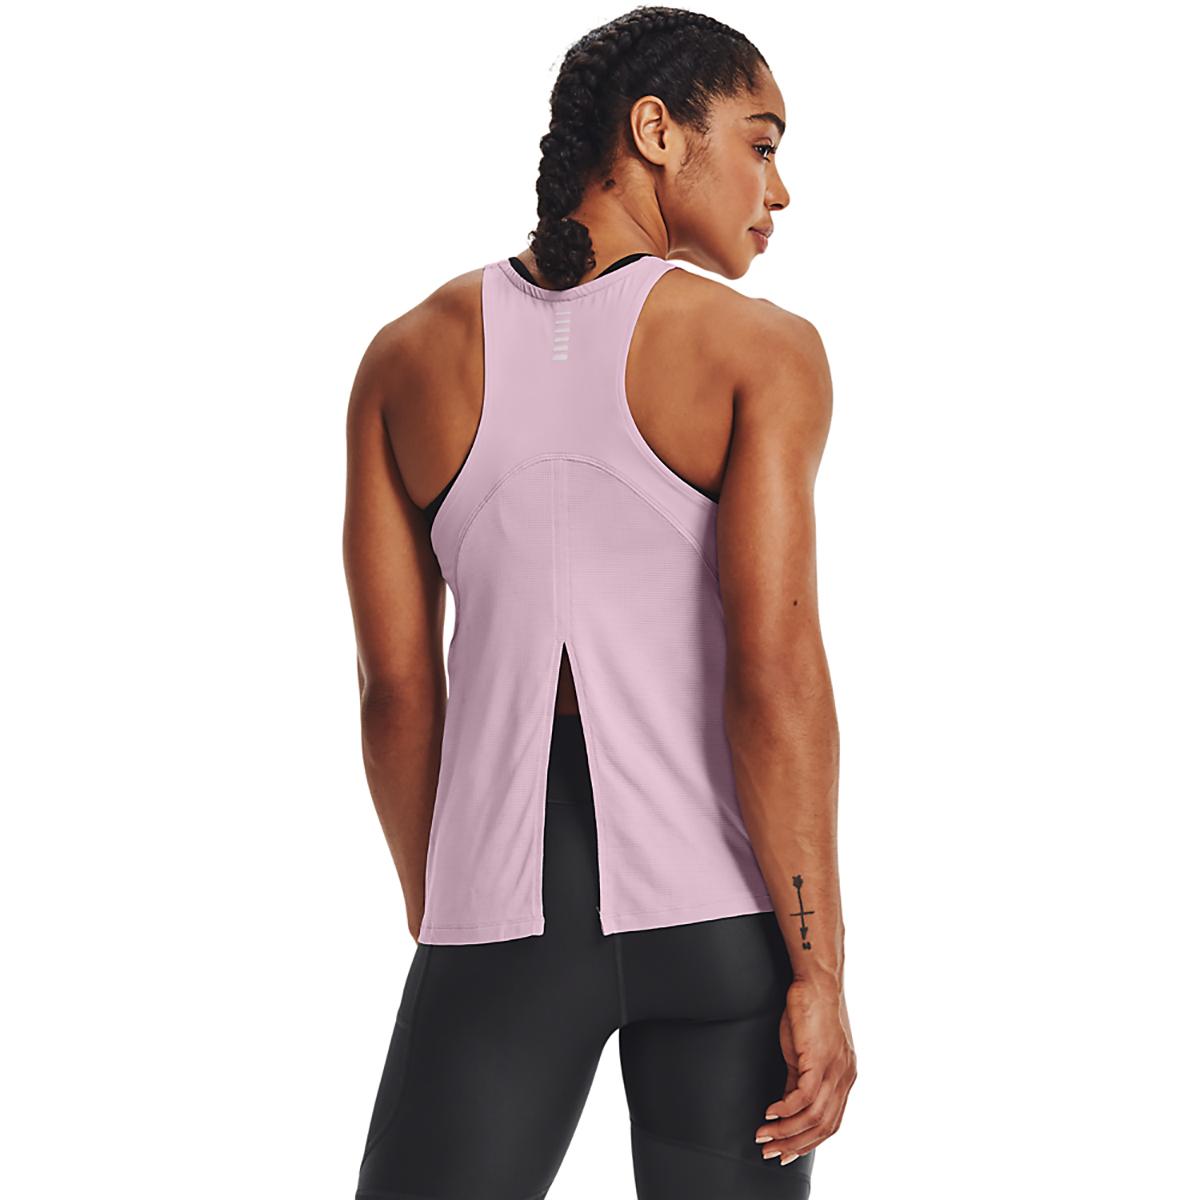 Women's Under Armour Iso-Chill Run 200 Tank - Color: Mauve Pink/Mauve Pink/Reflective - Size: XS, Mauve Pink/Mauve Pink/Reflective, large, image 2